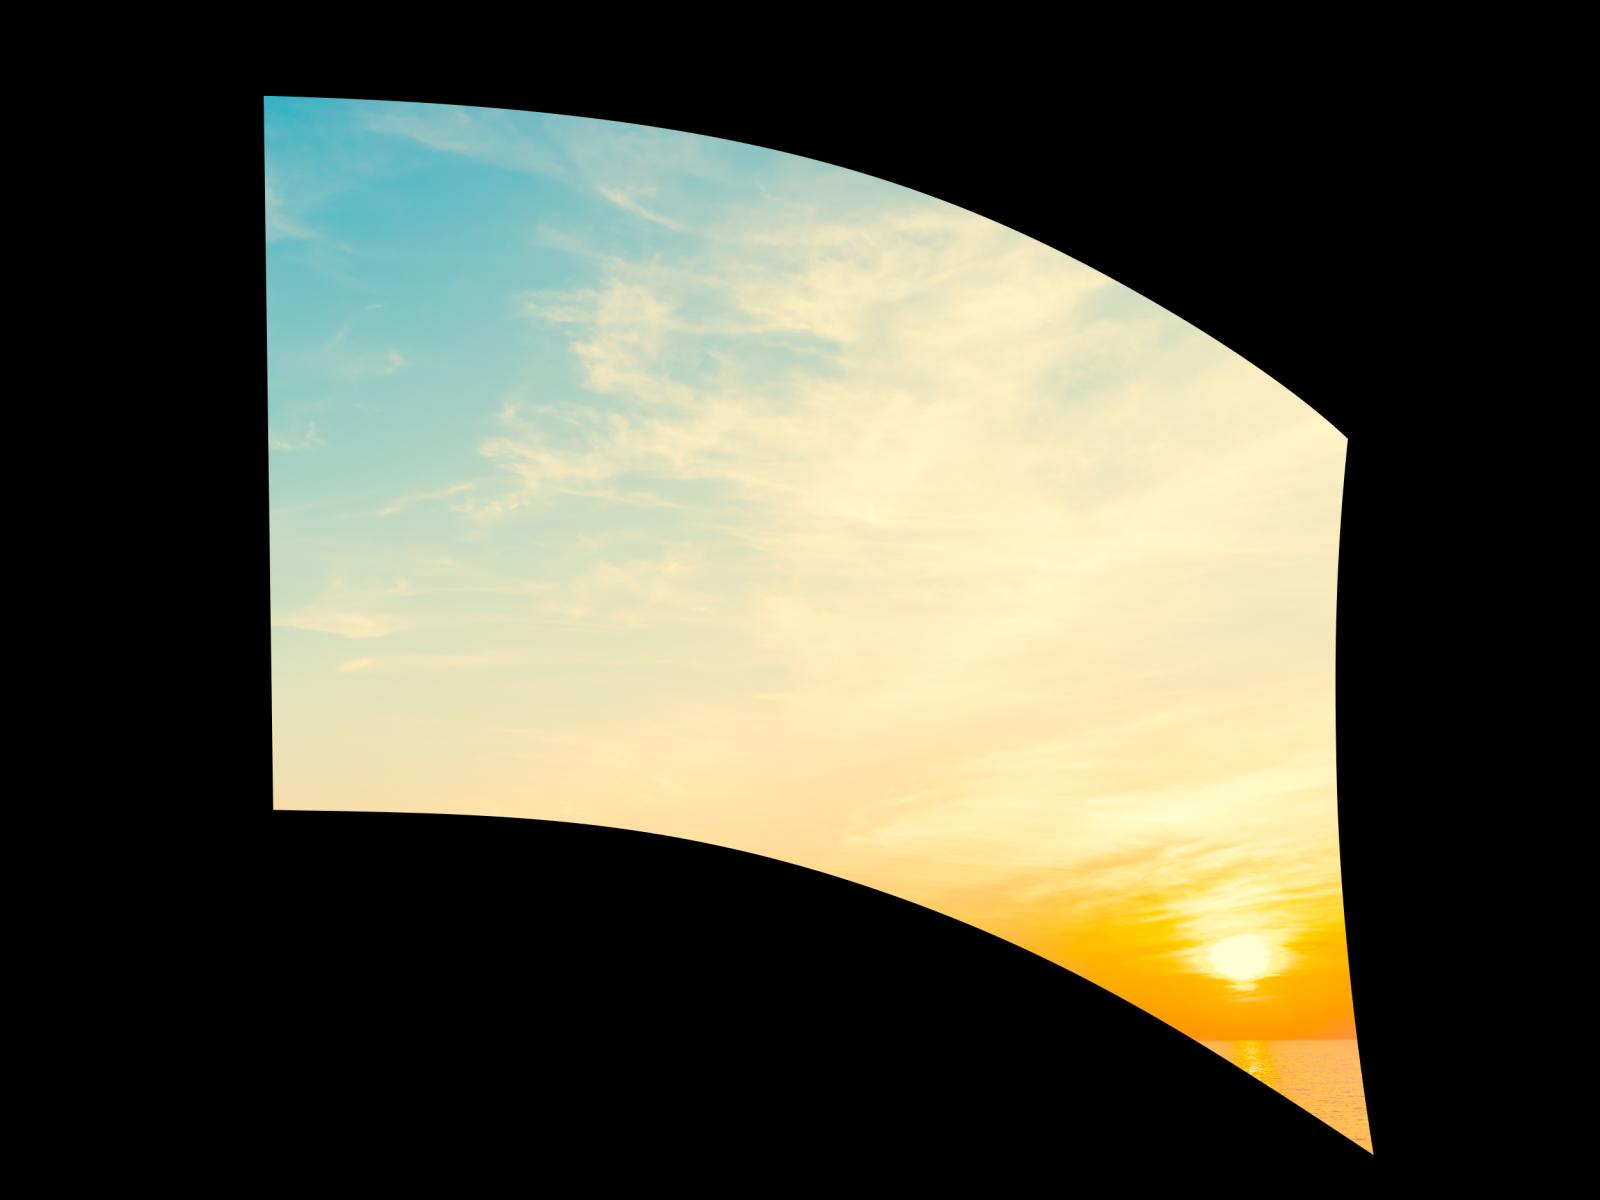 050307s - 36x52 Standard Corner Sunset